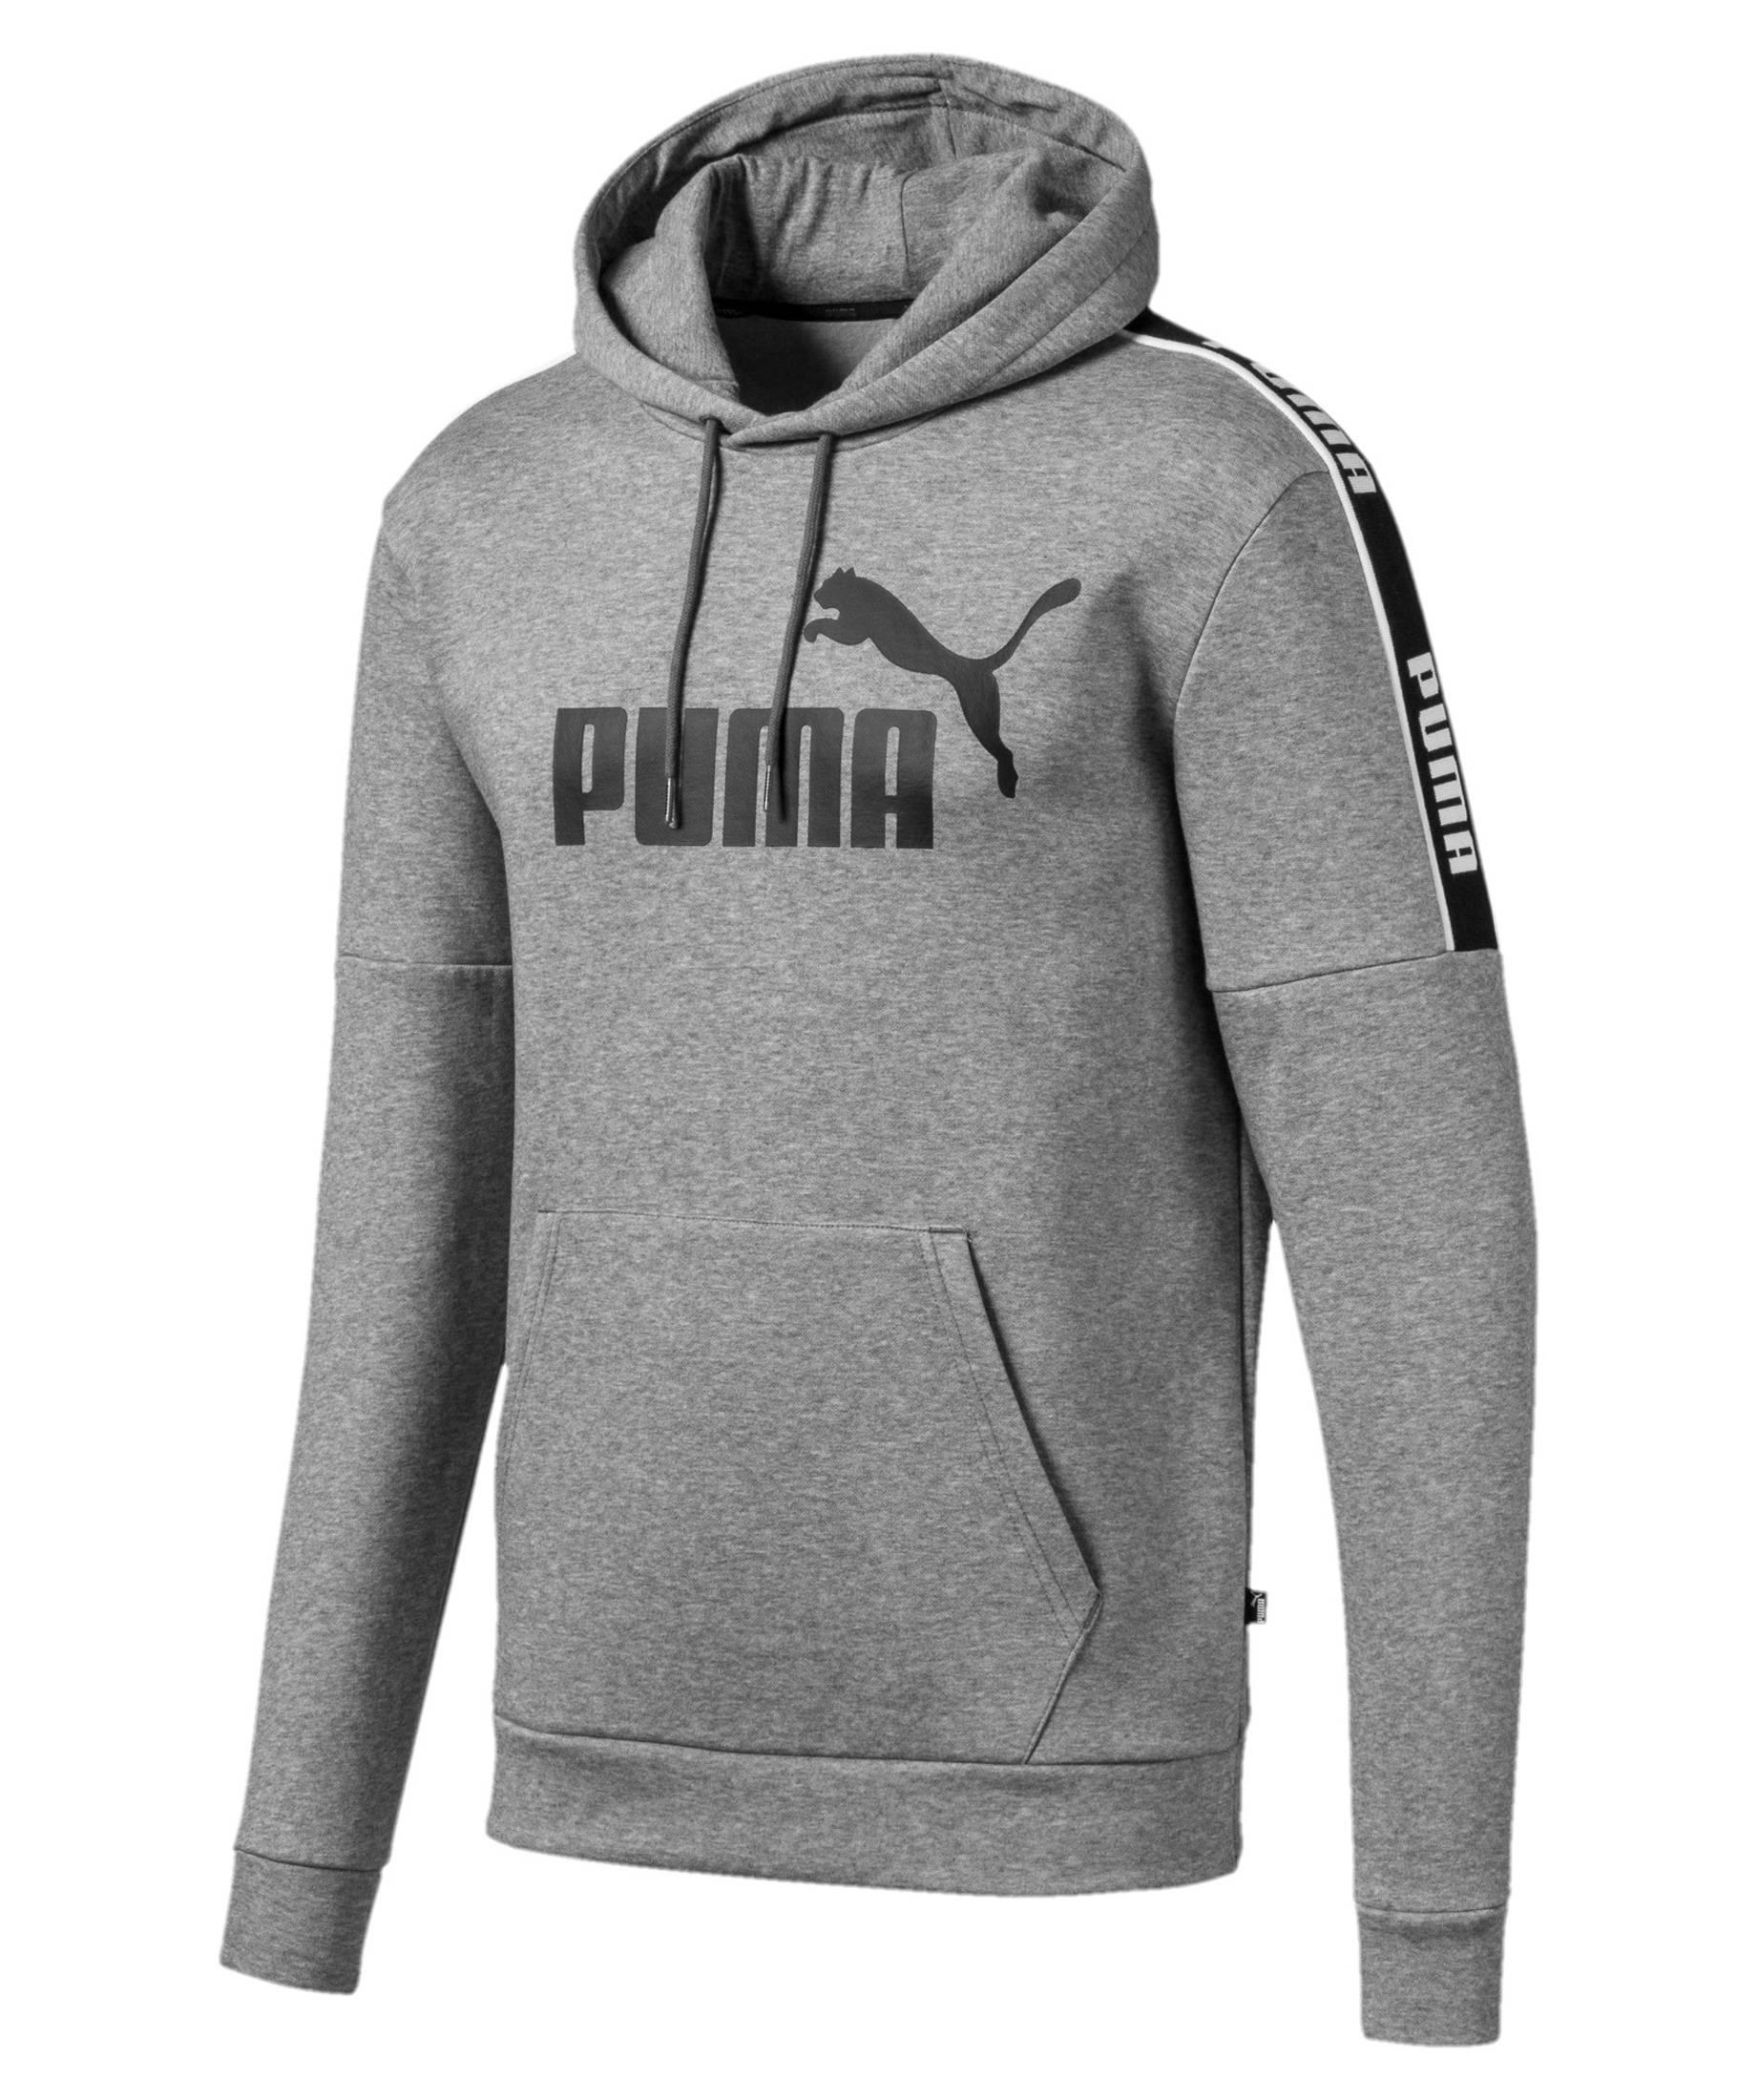 Puma Herren Sweatshirt mit Kapuze Amplified Hoodie FL